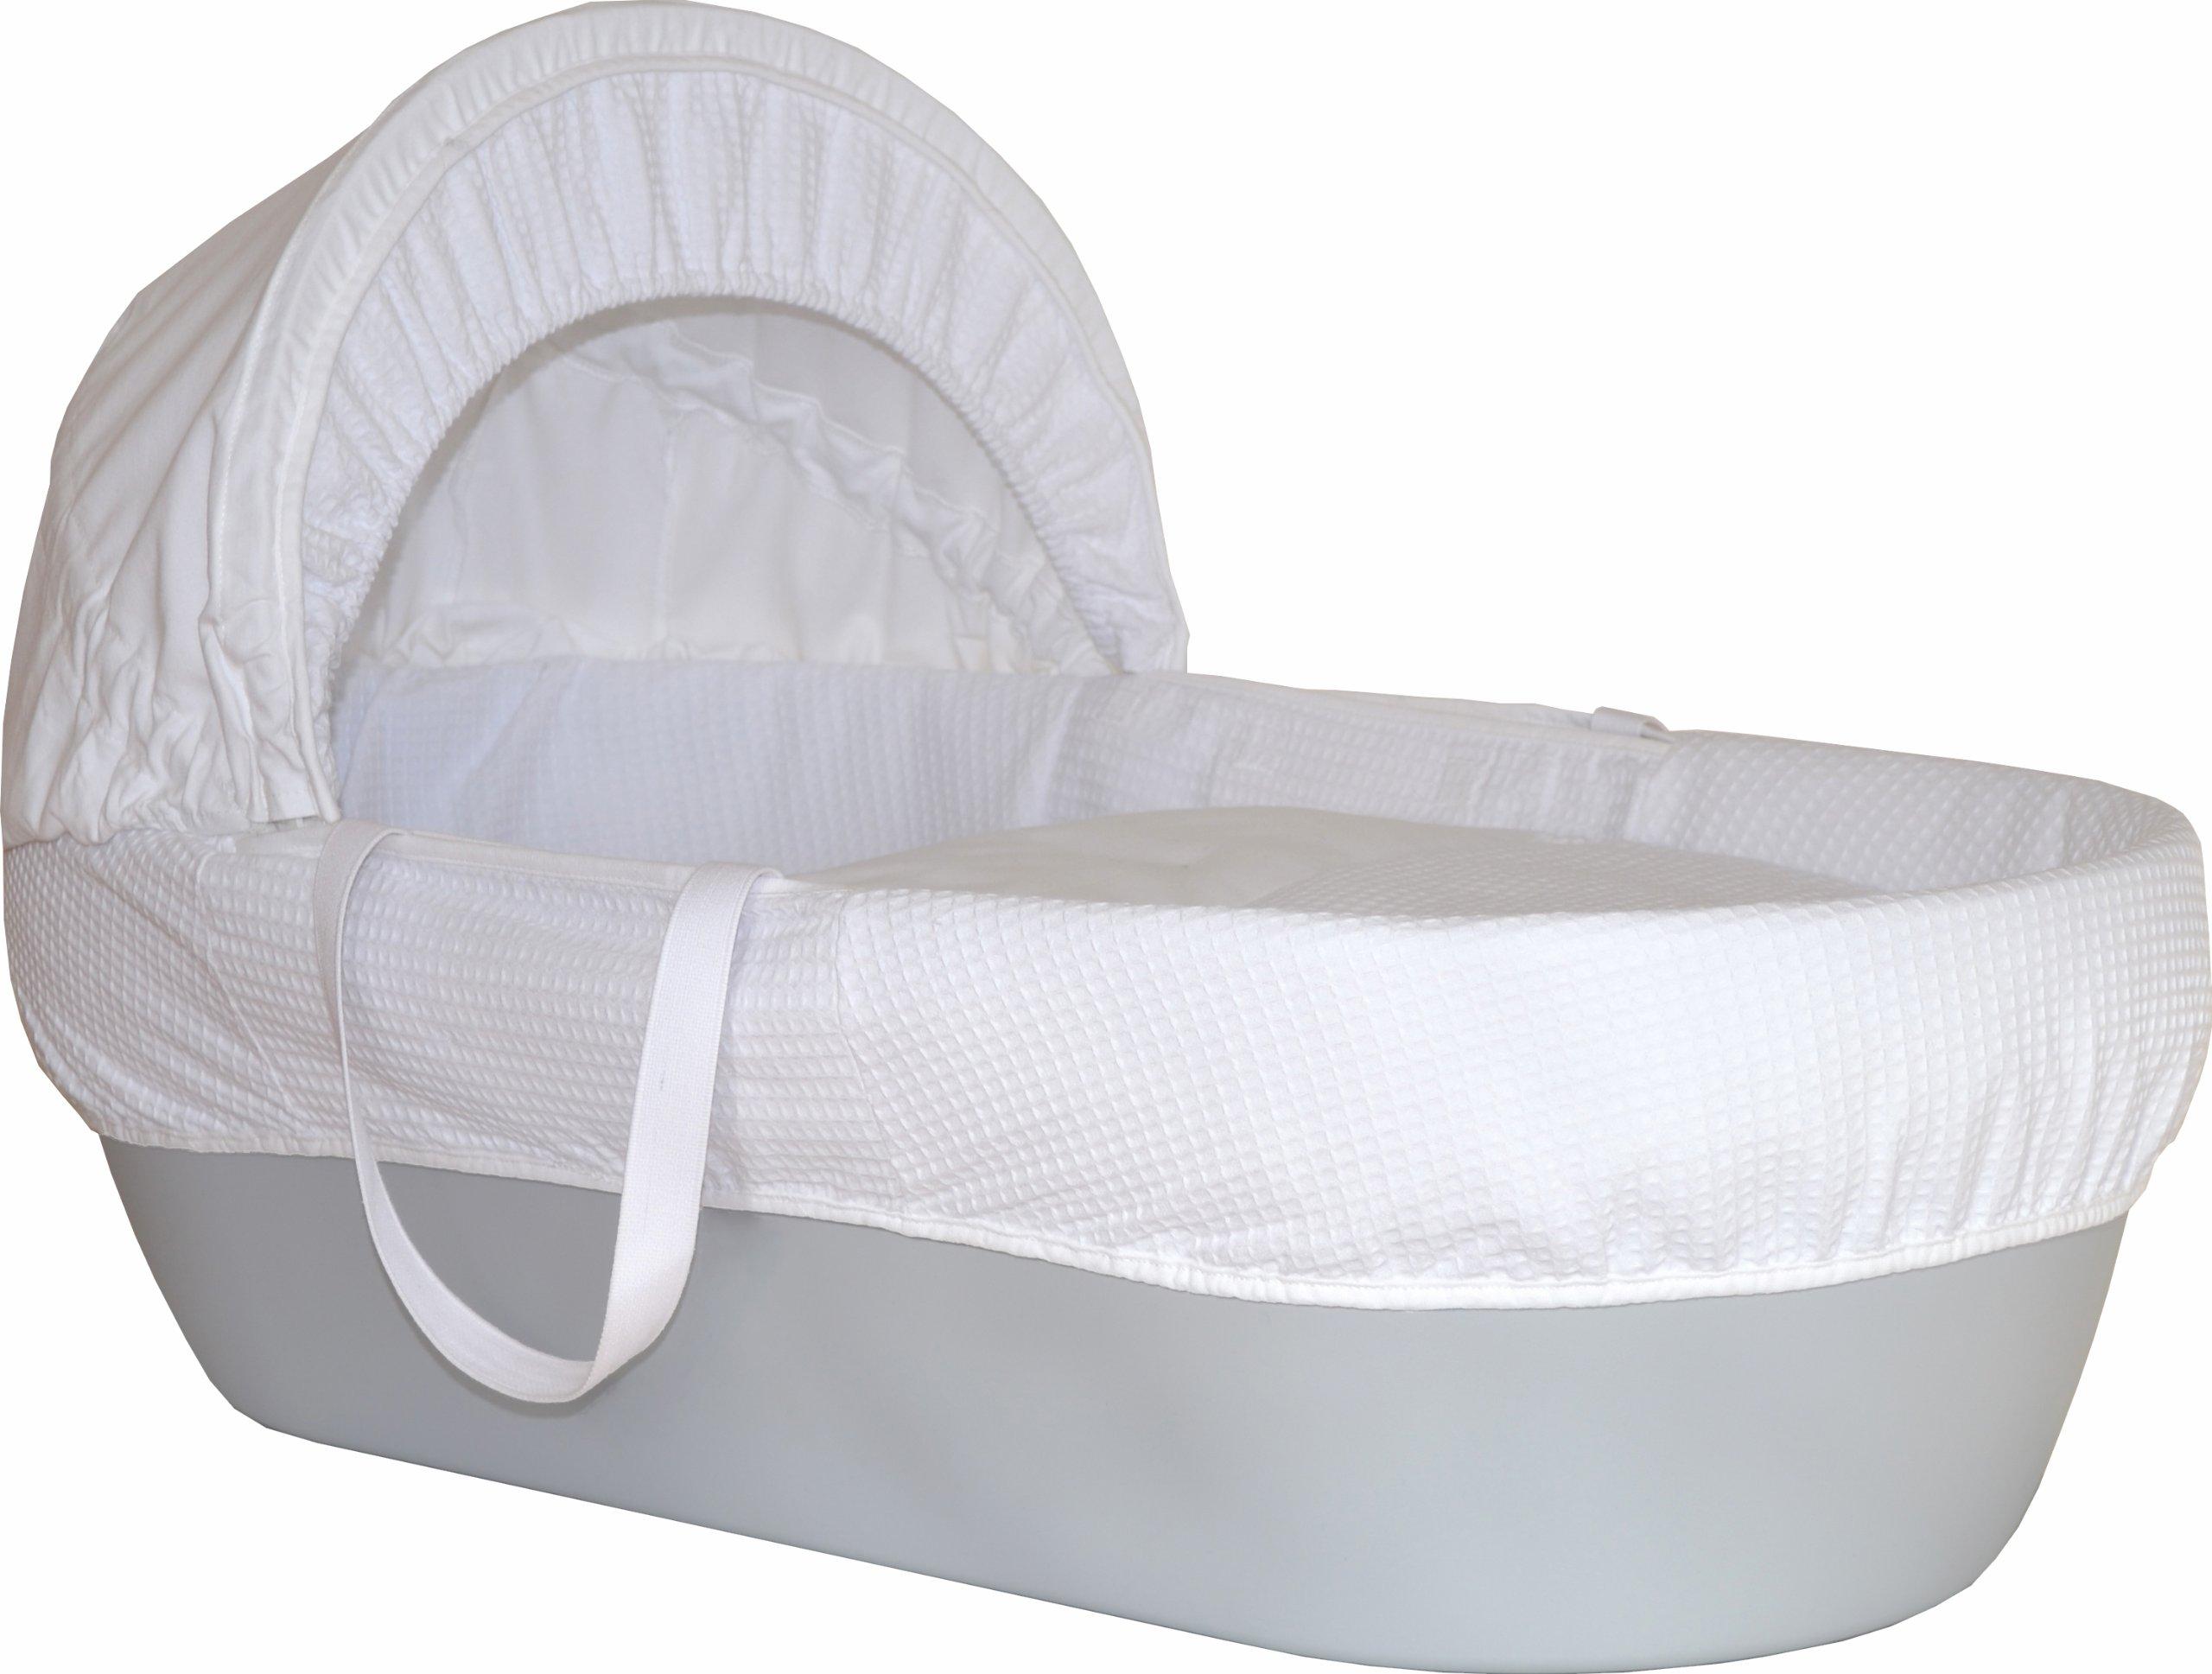 Shnuggle Moses Basket with White Waffle Cotton Dressing Hood and Mattress Pebble Grey Basket